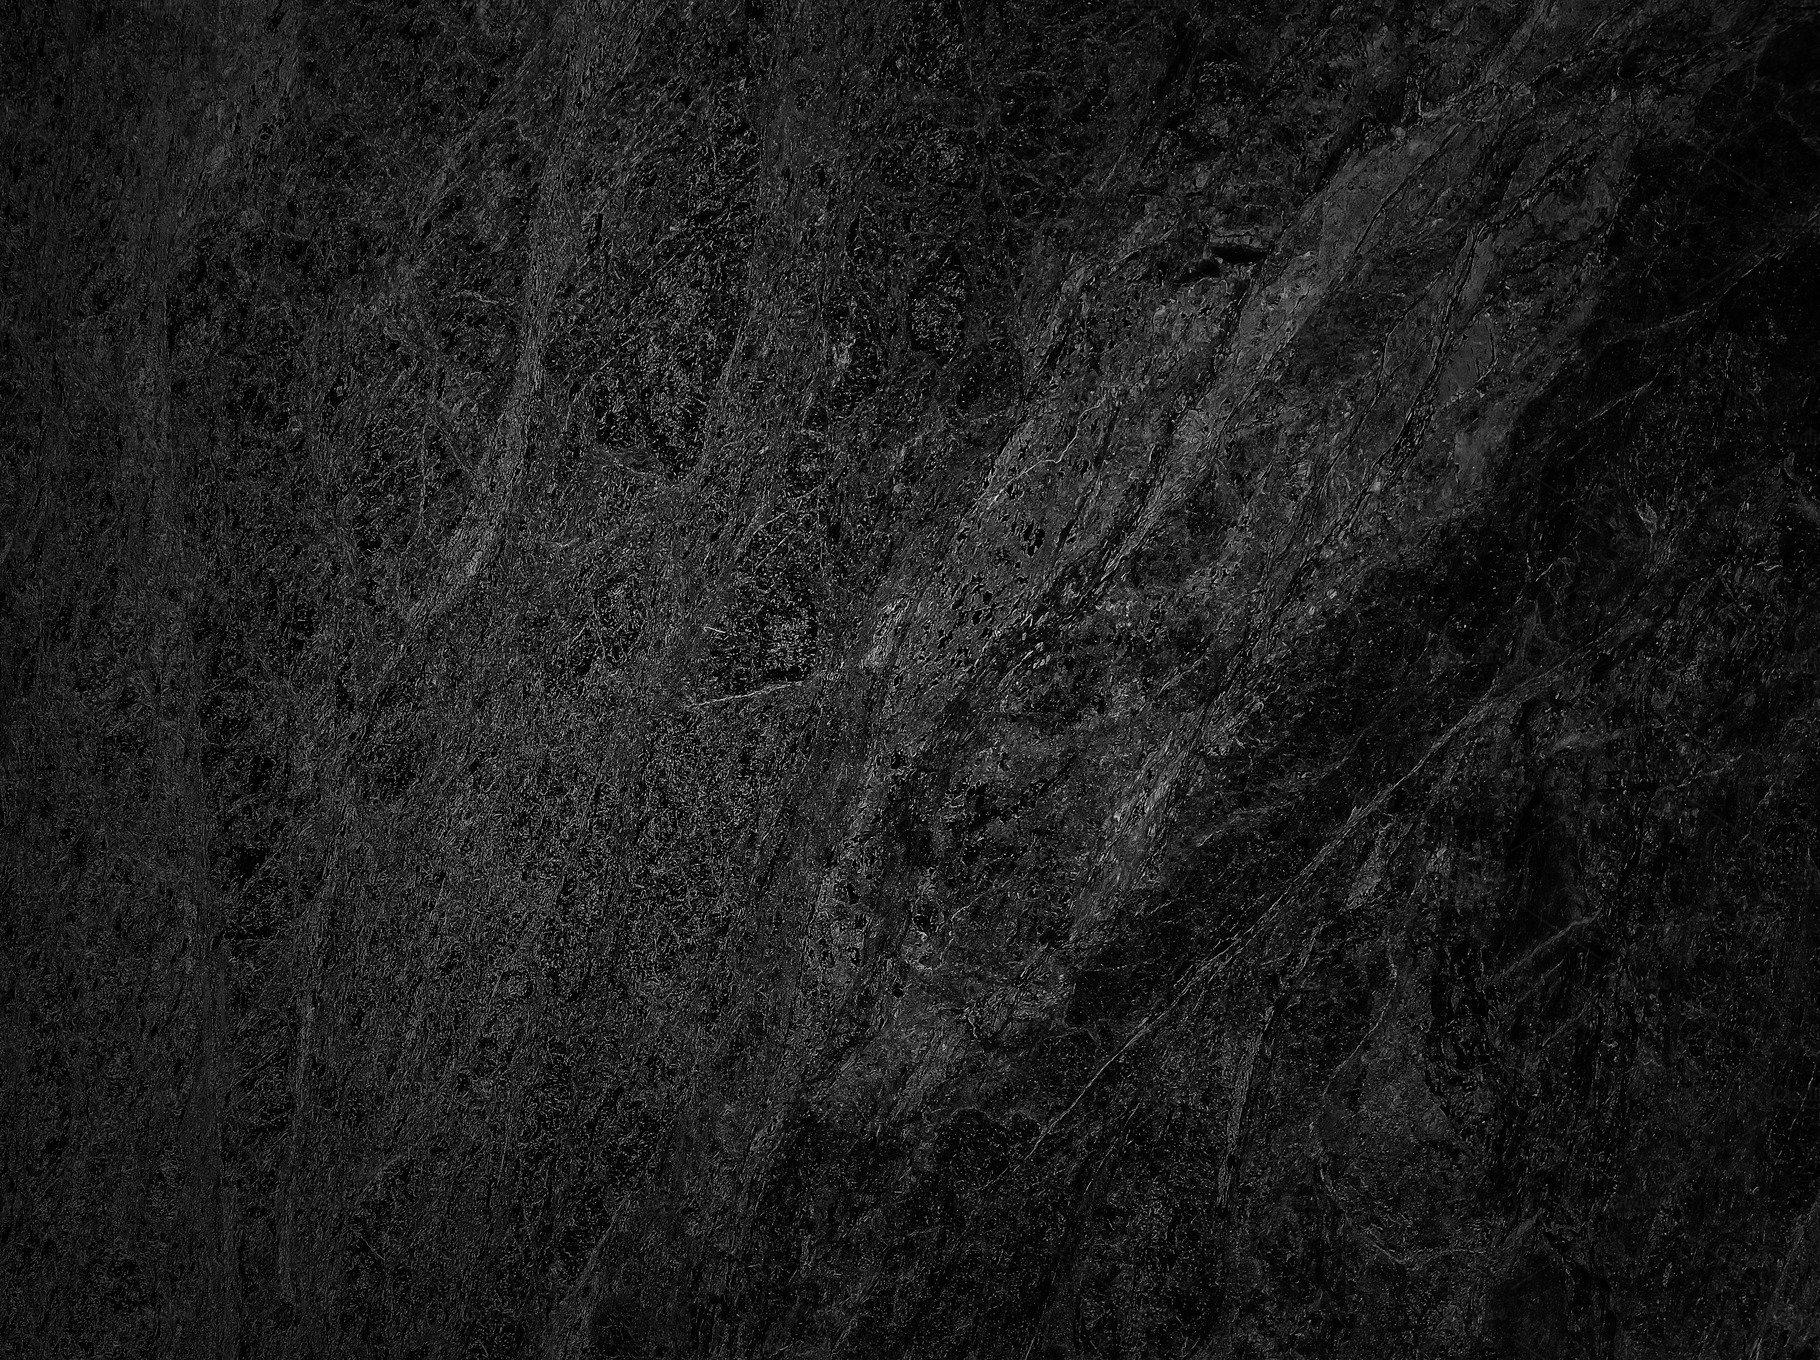 Black marble texture background ~ Architecture Photos ~ Creative Market